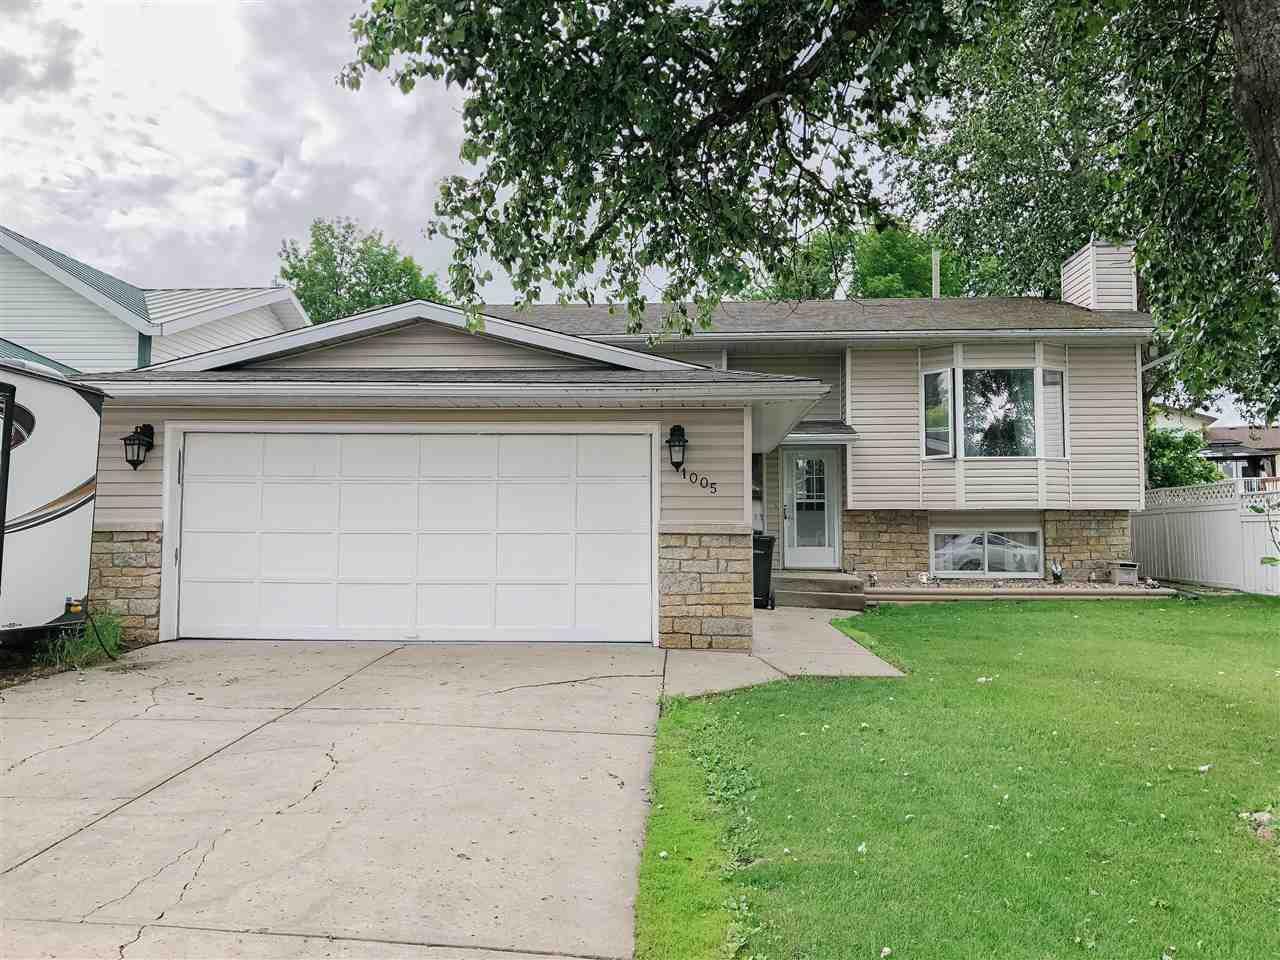 Main Photo: 1005 12 Avenue: Cold Lake House for sale : MLS®# E4162087